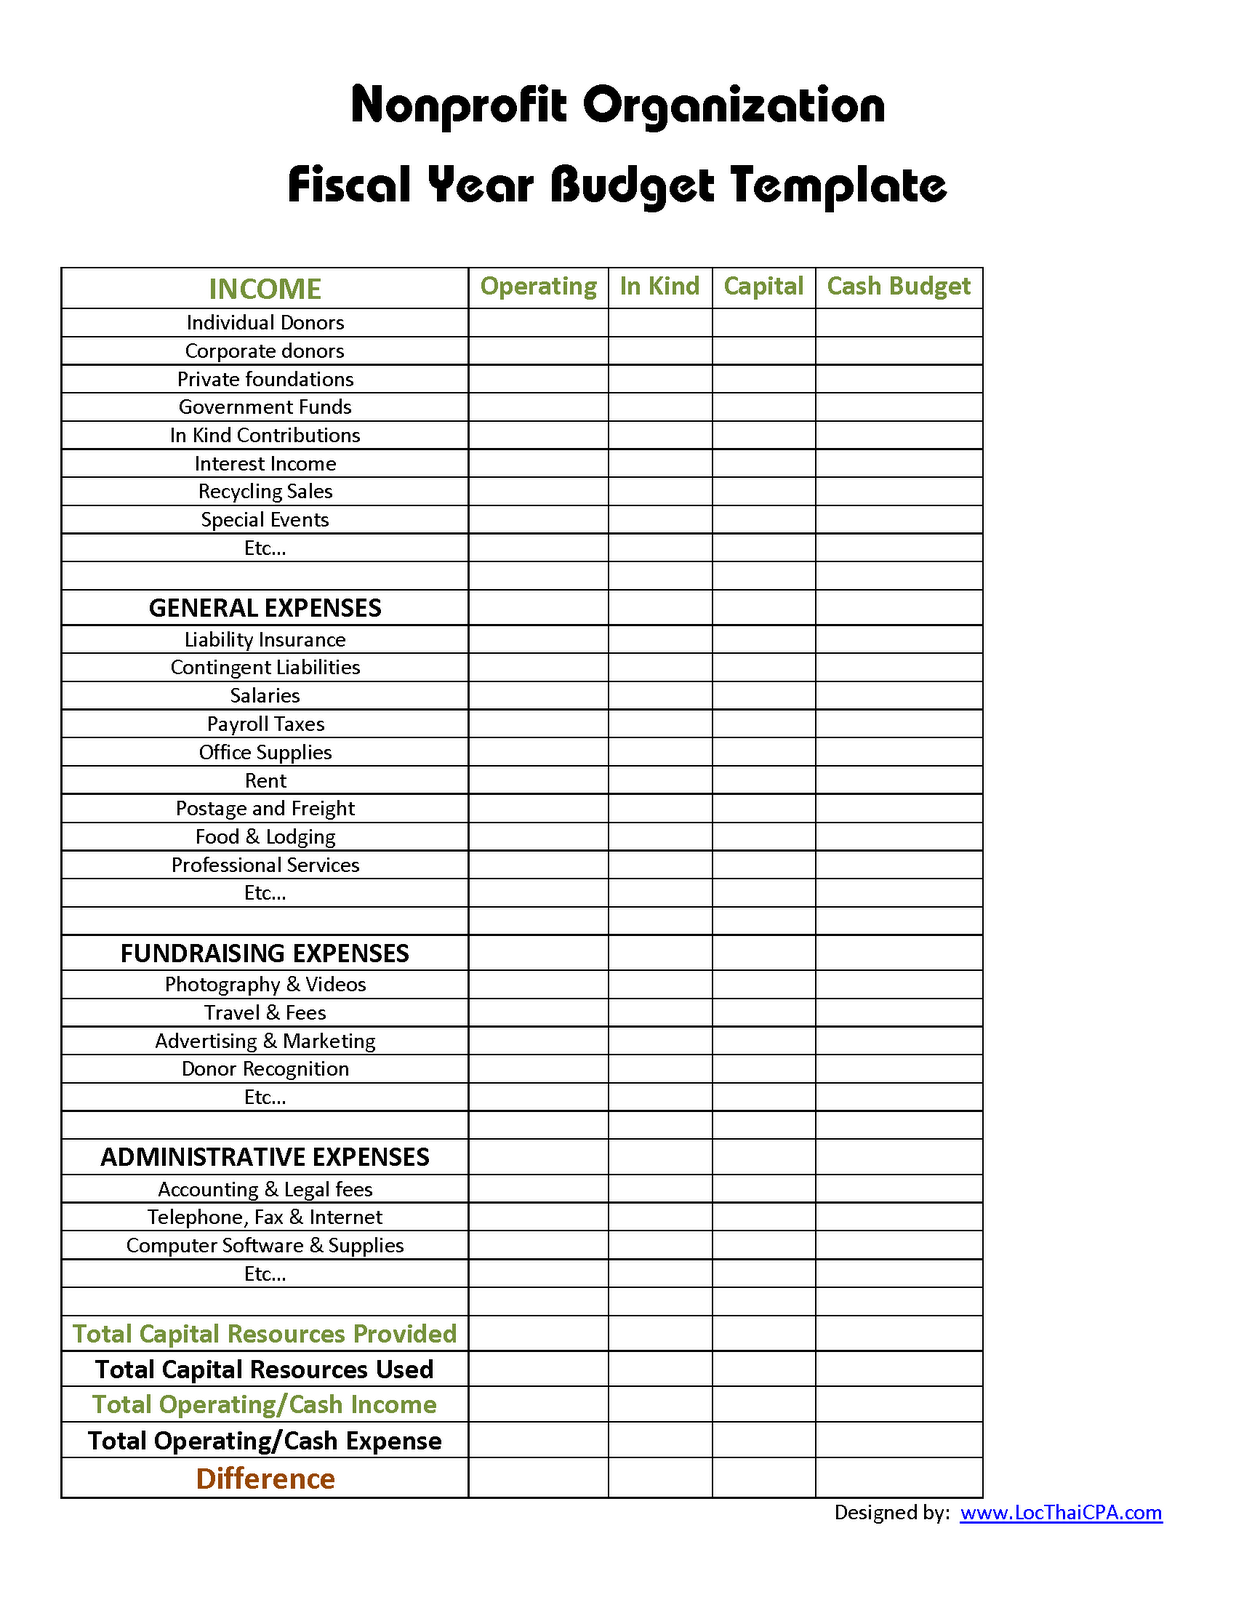 charter school budget template - year budget template